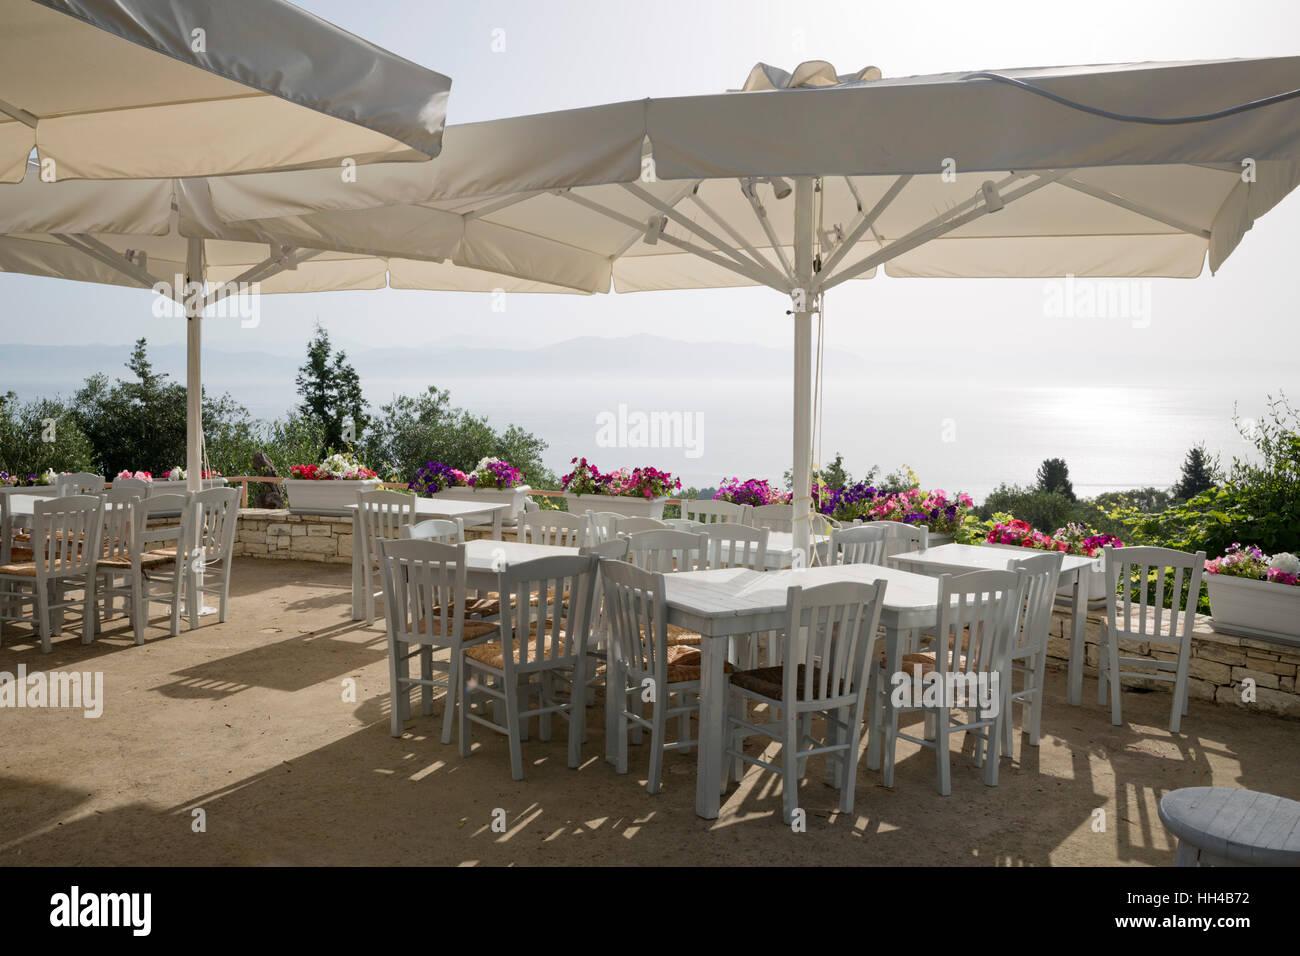 Pratigos restaurant, near Longos, Paxos, Ionian Islands, Greek Islands, Greece, Europe - Stock Image